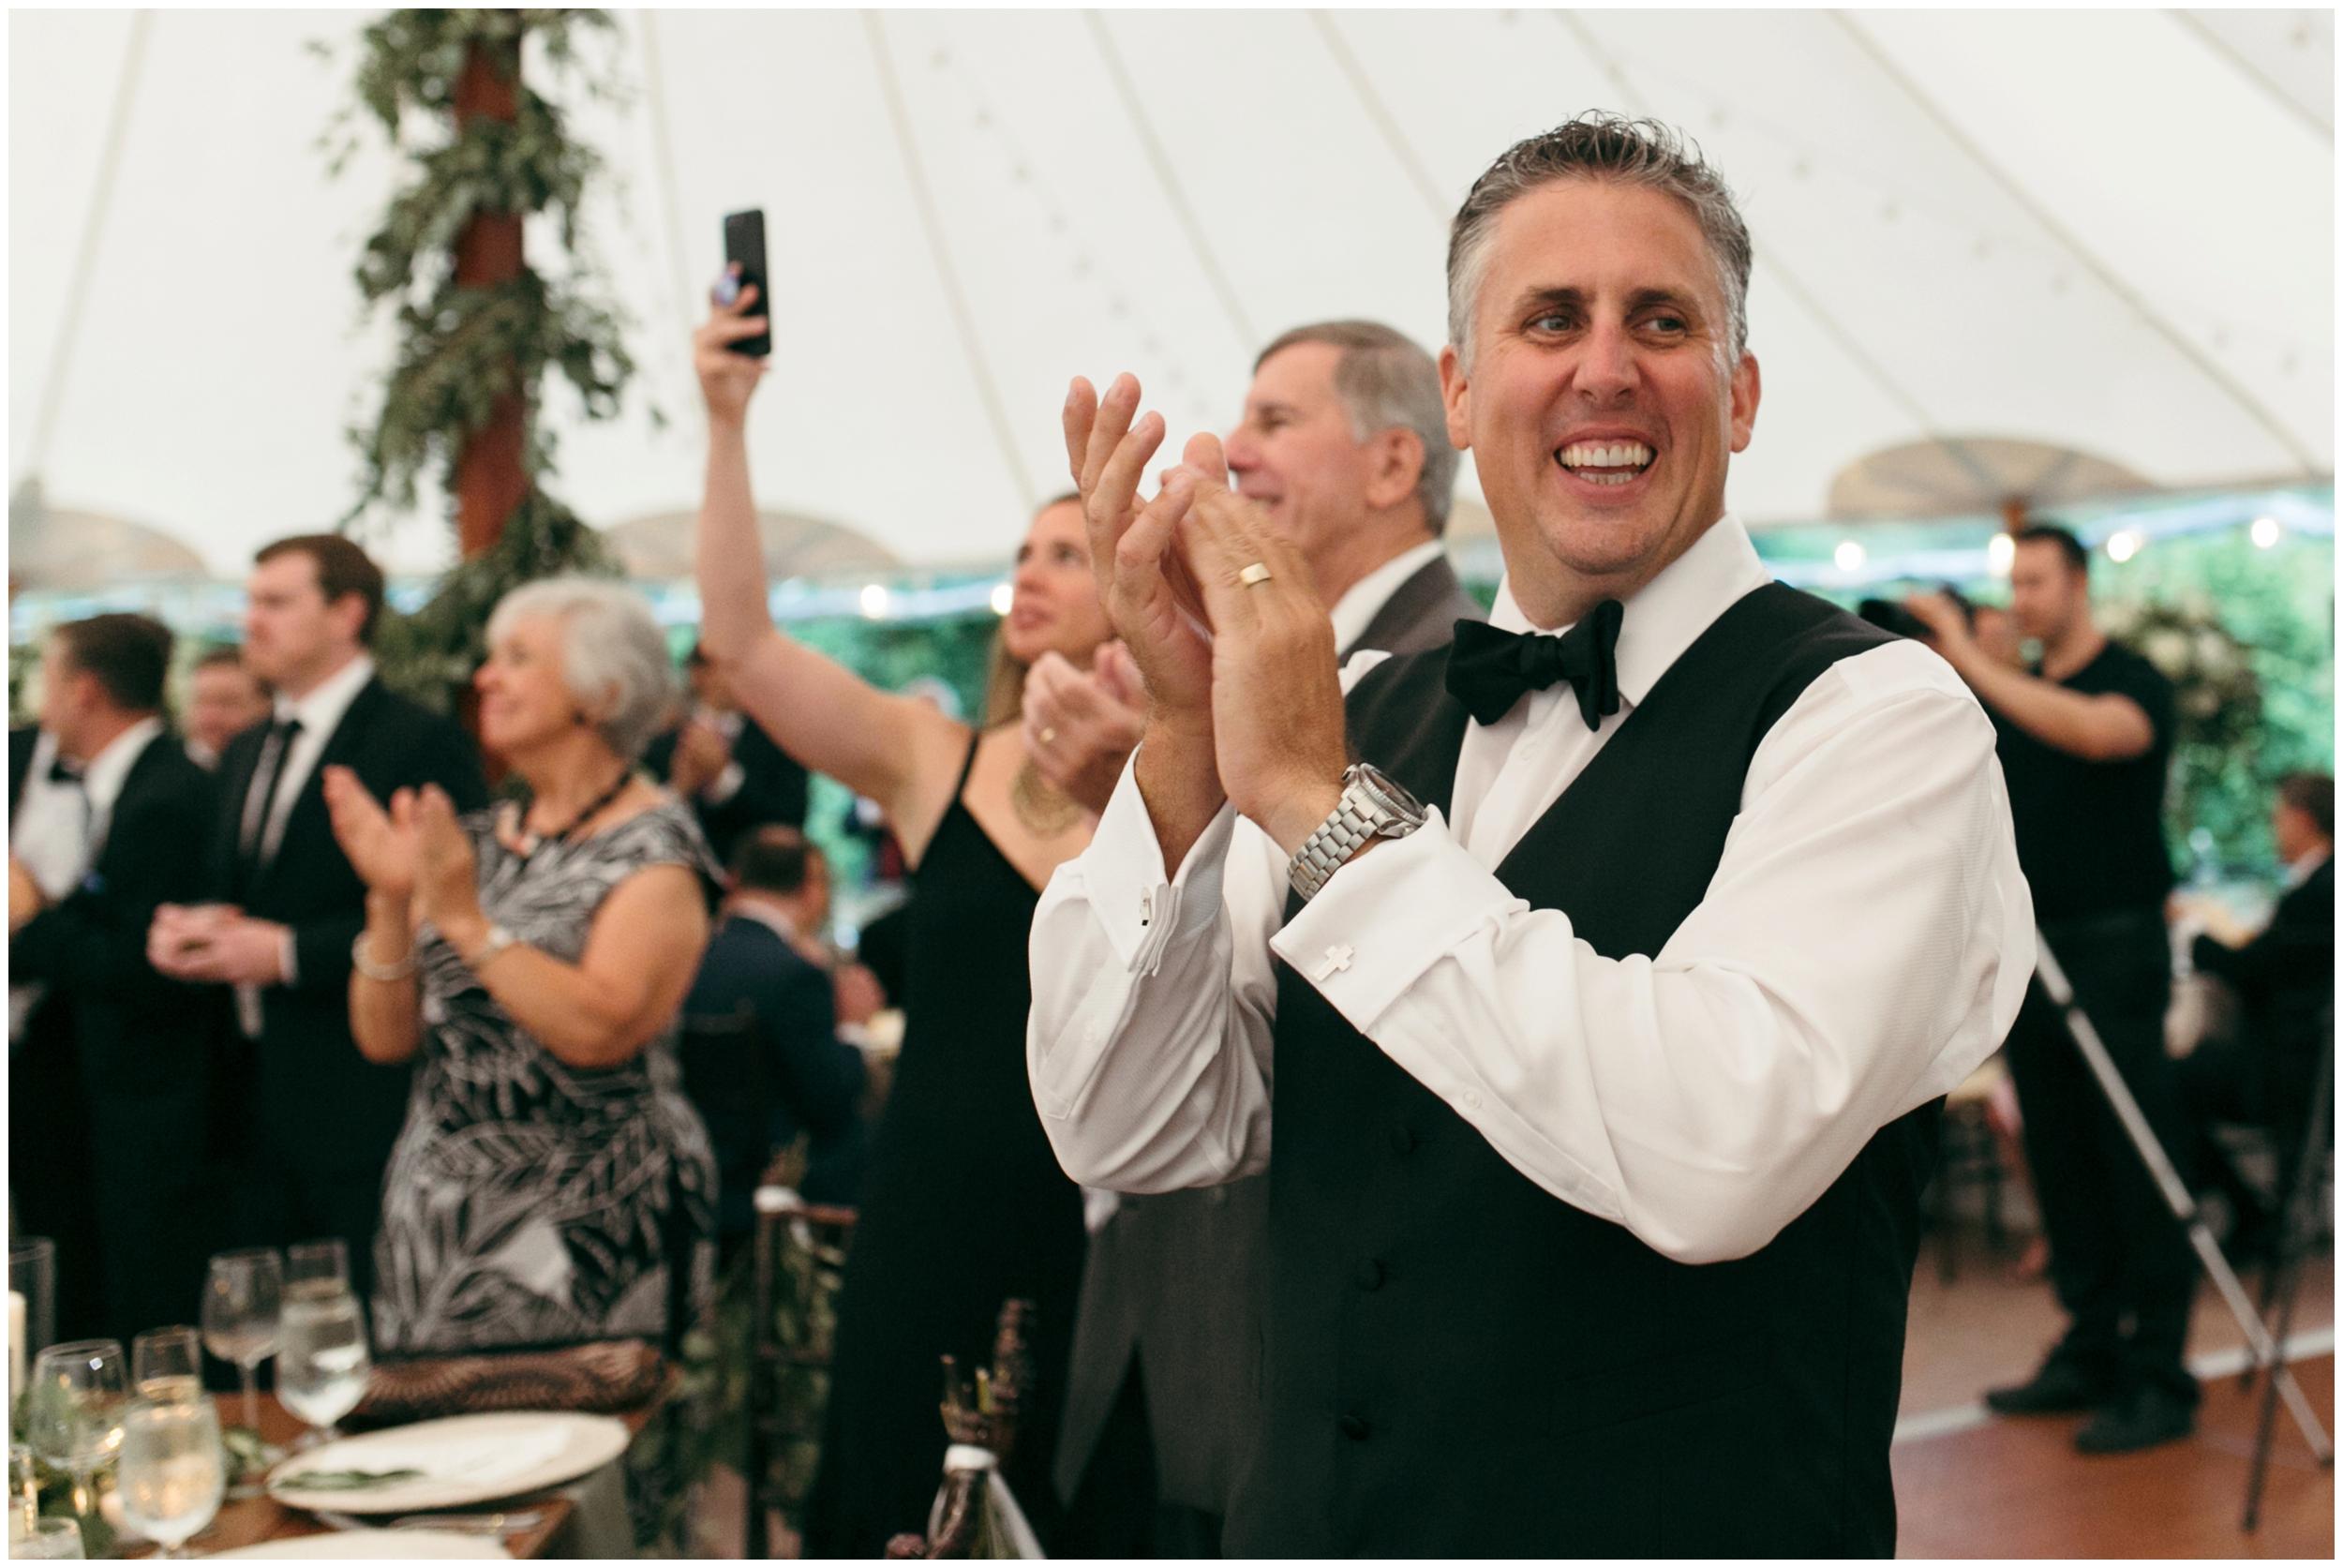 Willowdale-Estate-Wedding-Bailey-Q-Photo-Boston-Wedding-Photographer-082.JPG